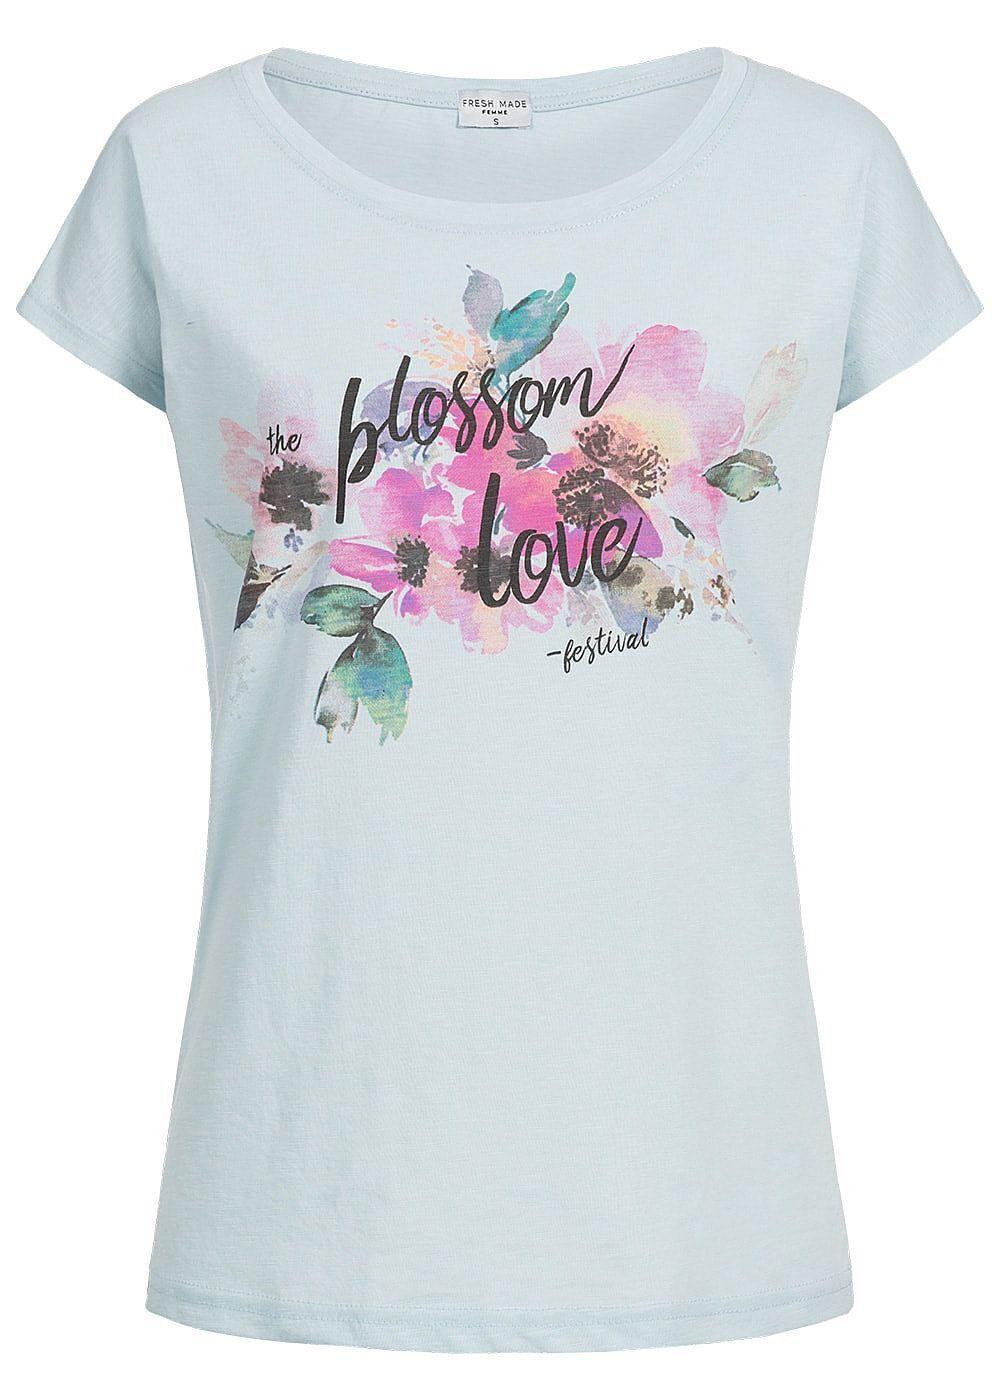 33% OFF B18042588 Damen Eight2Nine T-Shirt Kurzarm Blumen Print hell blau rosa